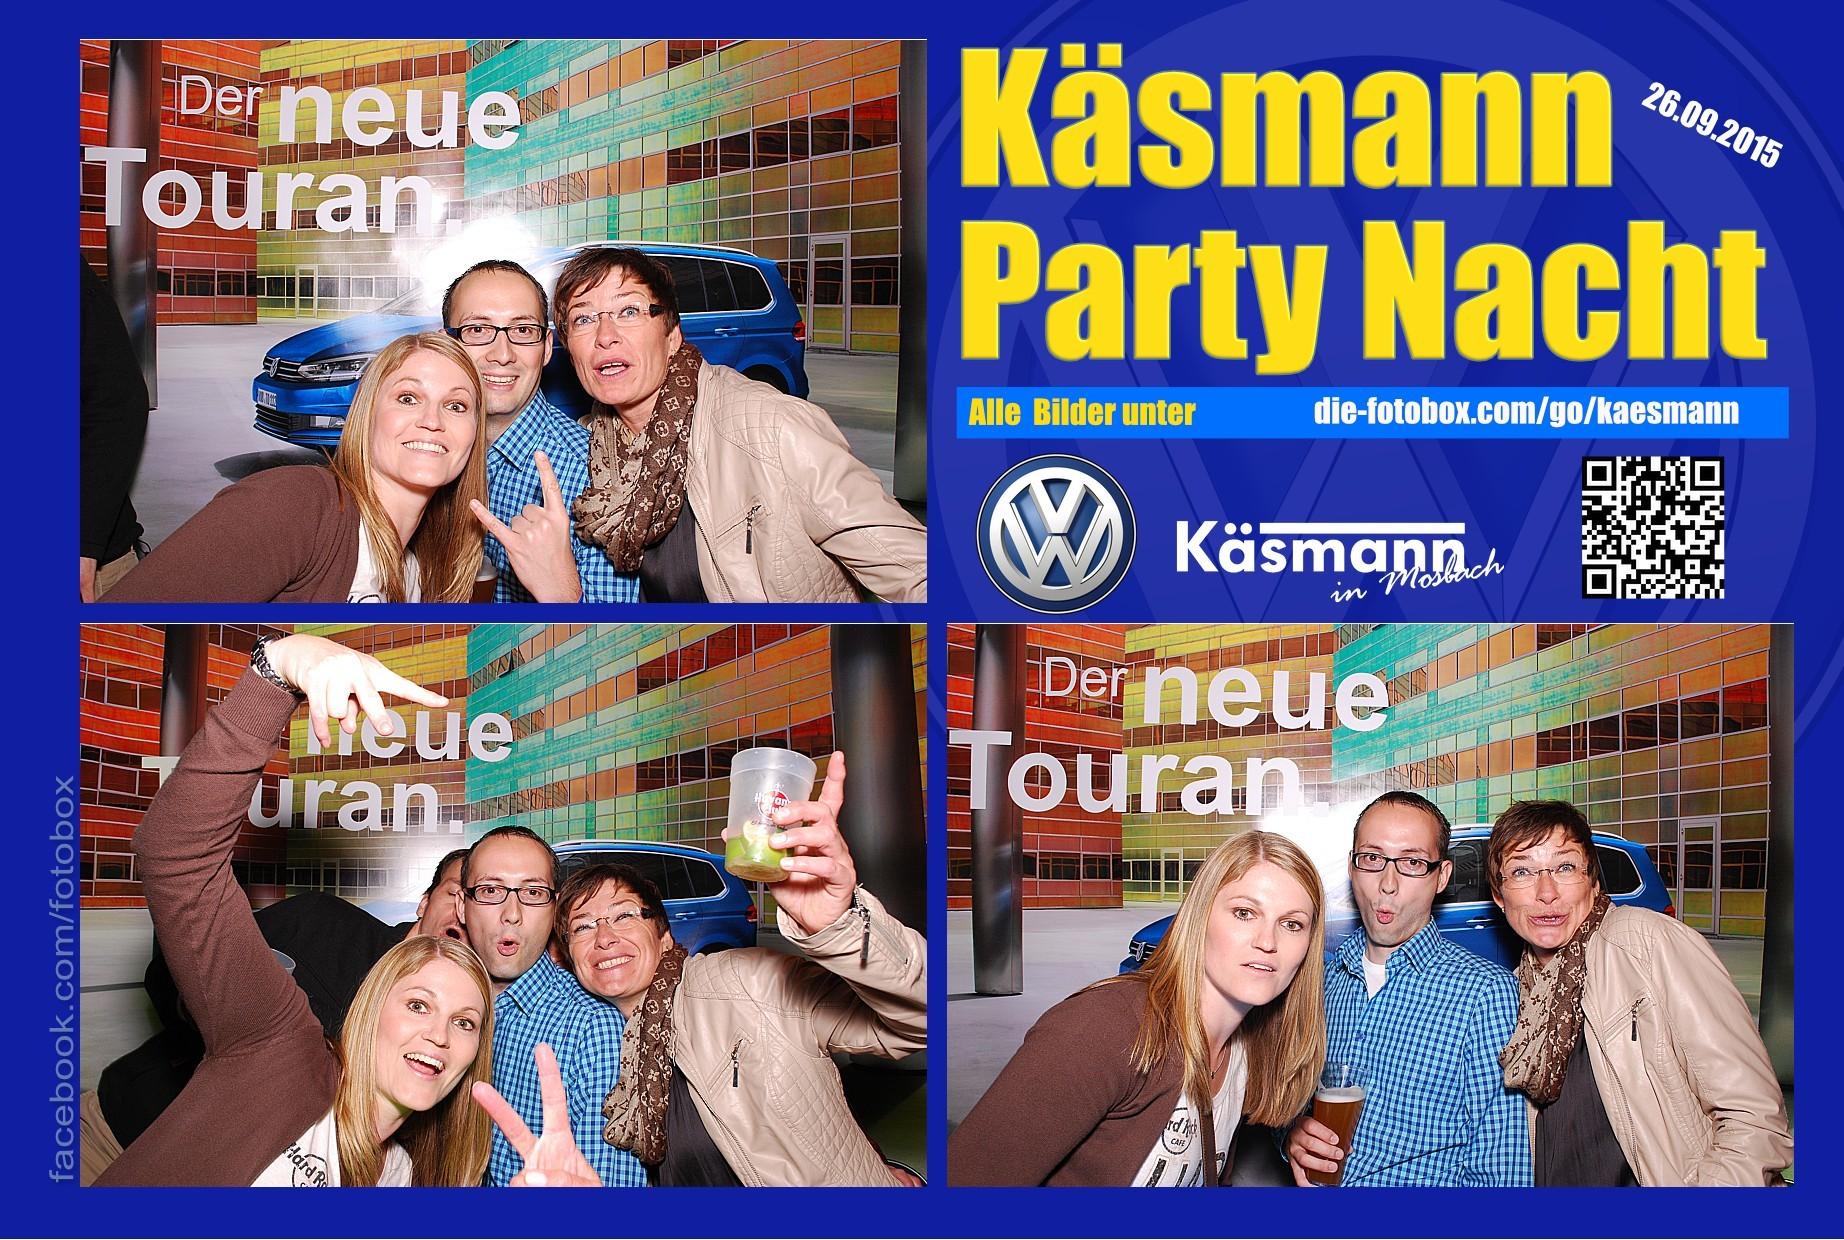 Käsmannparty 2015 - www.die-fotobox.com 01384